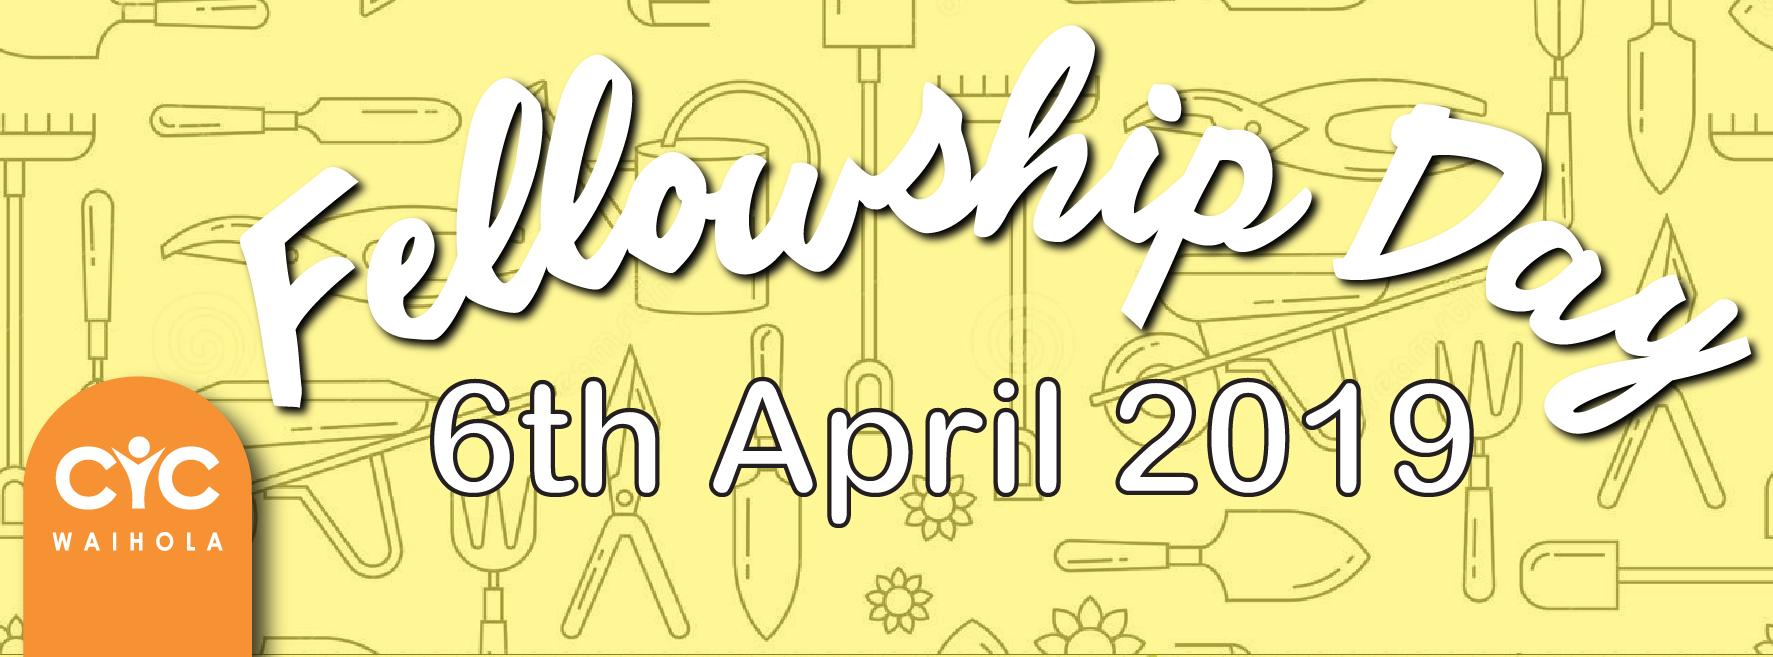 Fellowship Day – 6th April 2019